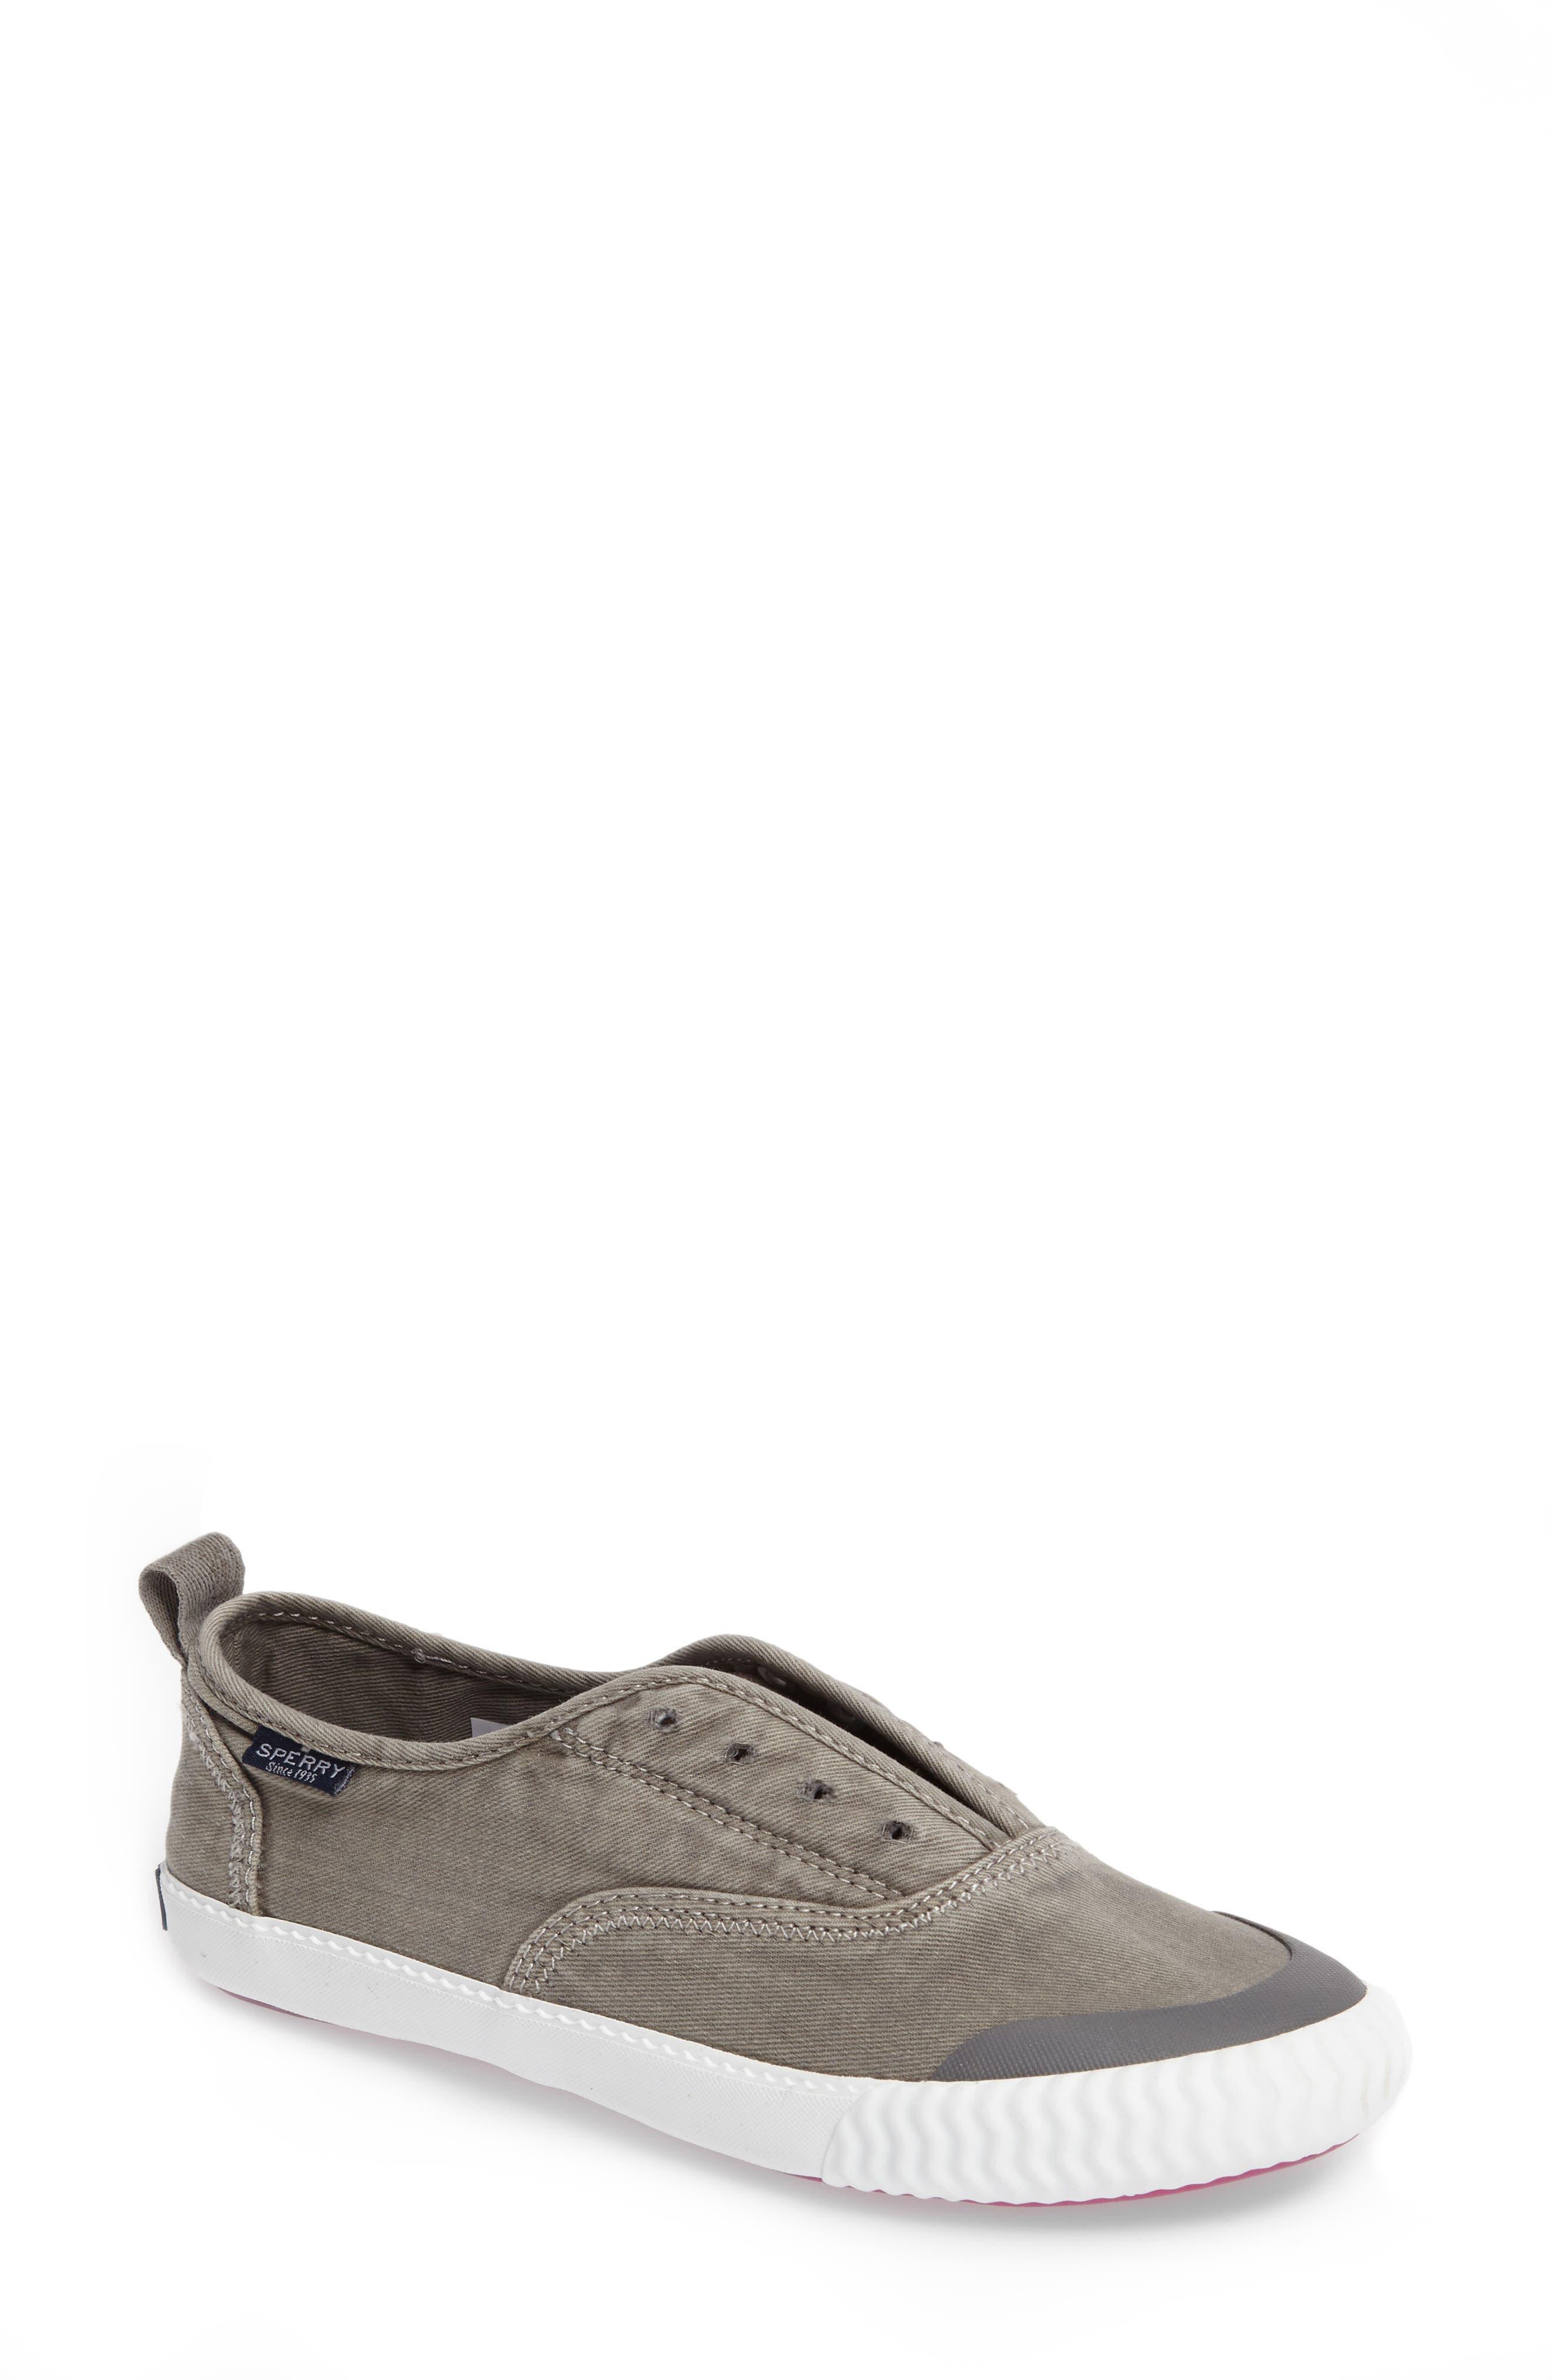 Sayel Slip-On Sneaker,                             Main thumbnail 1, color,                             GREY FABRIC